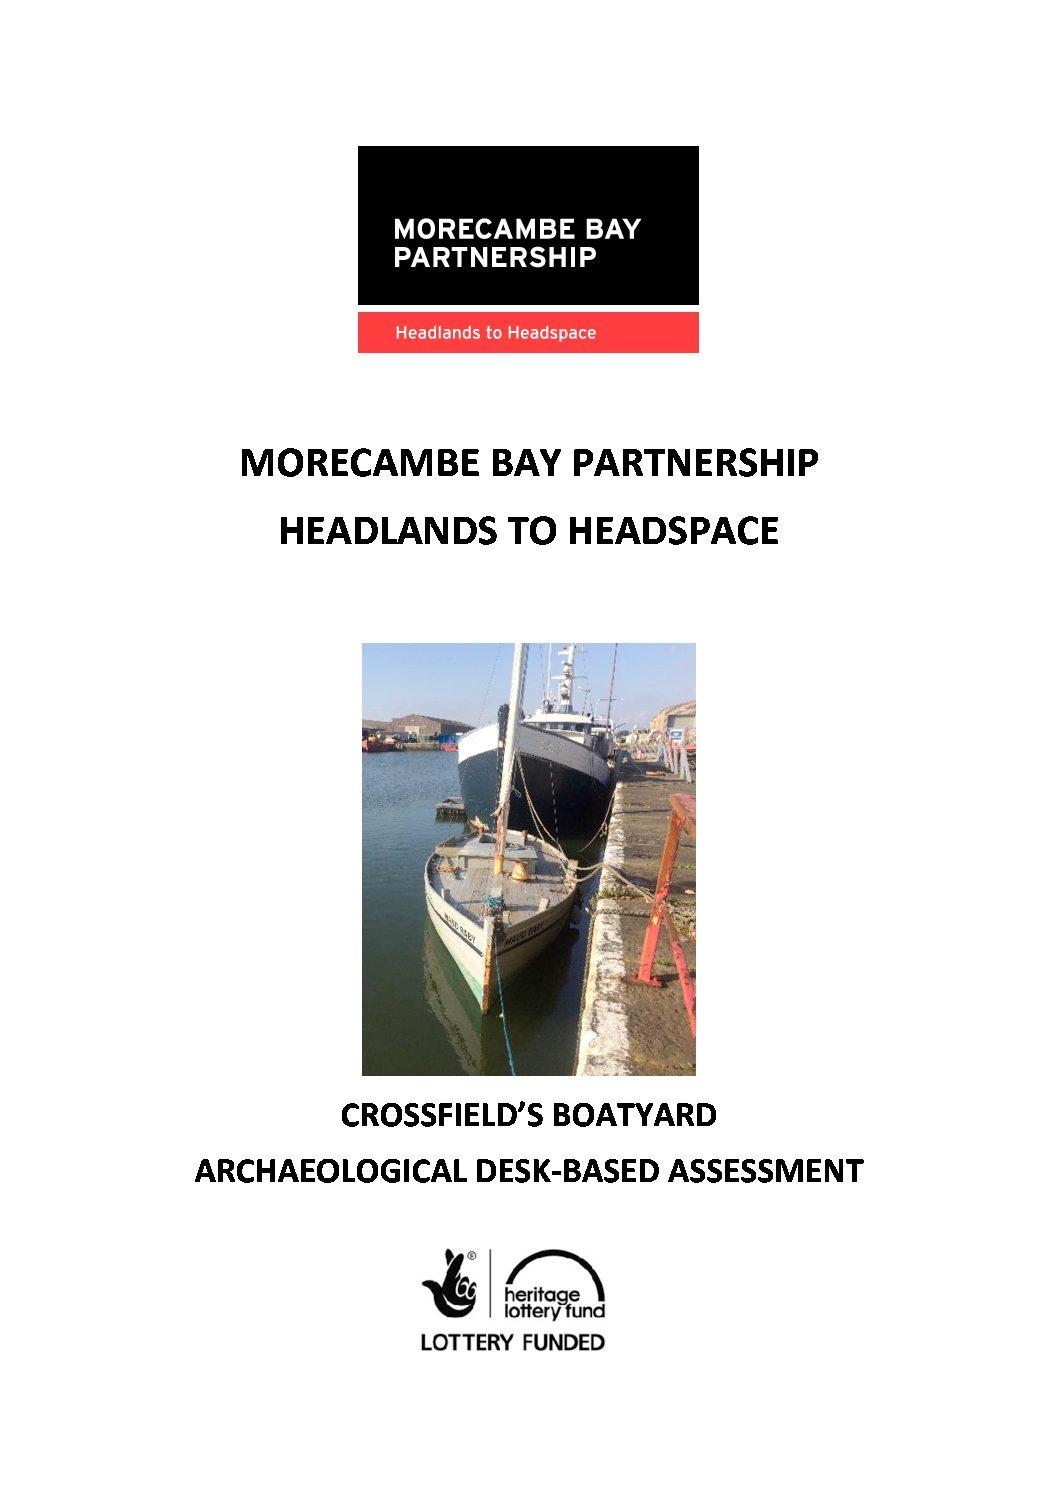 Crossfield's Boatyard Archaeological Desk-Based Assessment